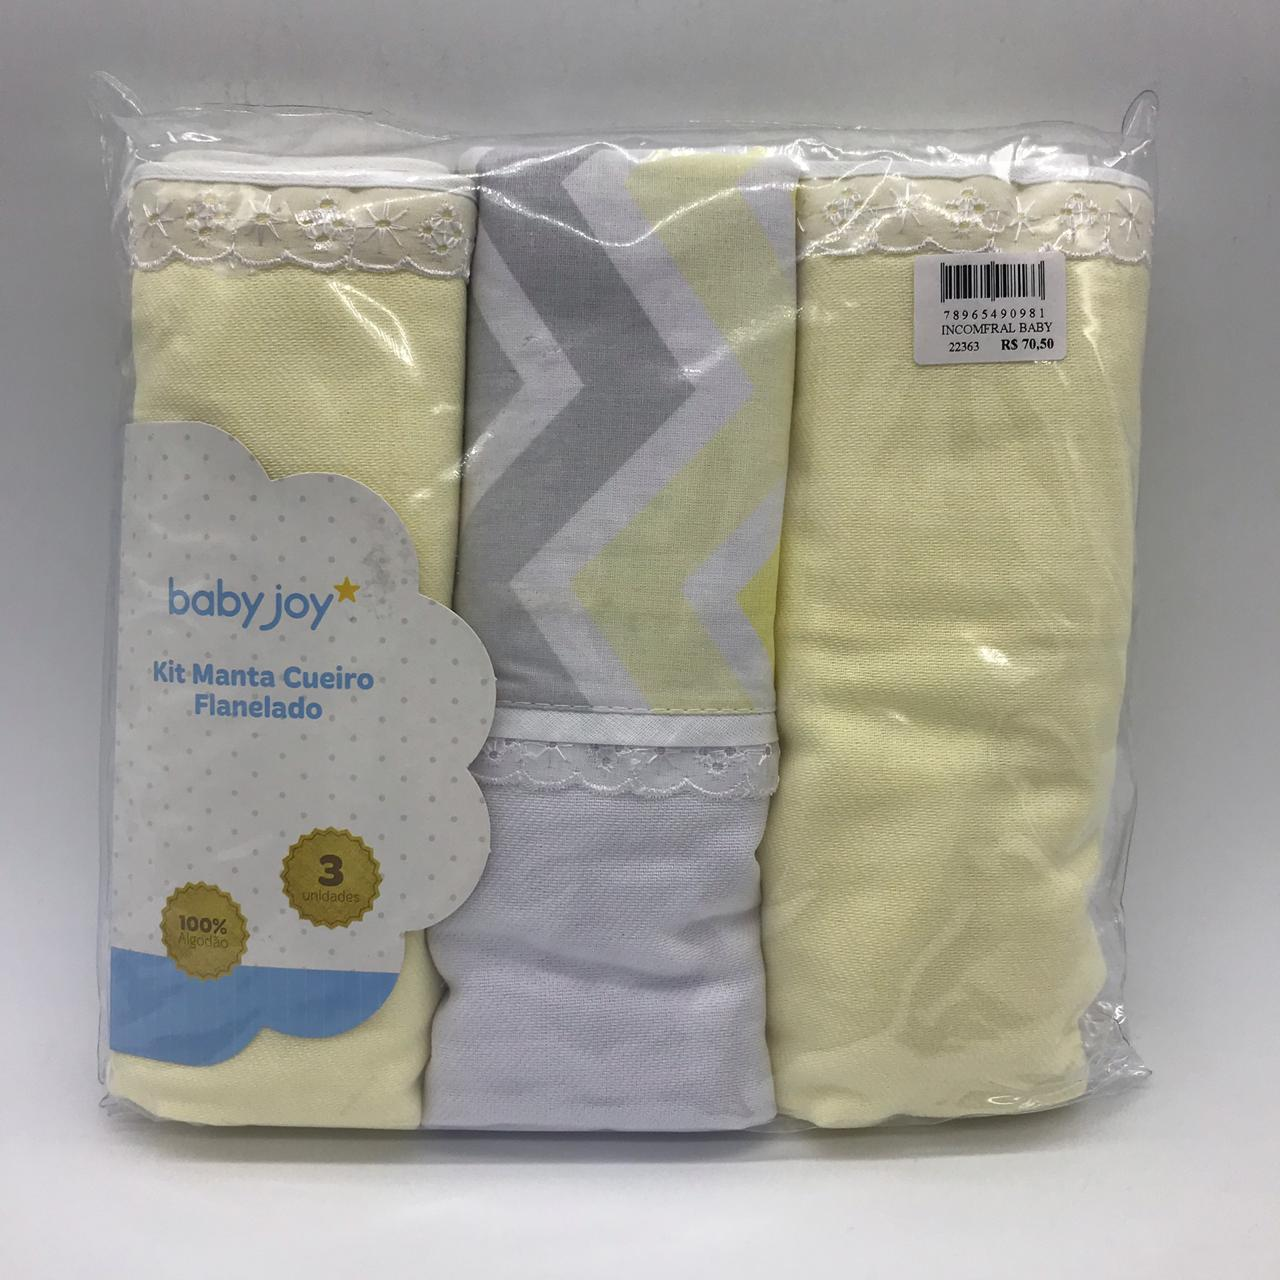 Kit Manta Cueiro 3 Und Flanelado Chevron Amarelo - Baby Joy Ref 0412150101-0003